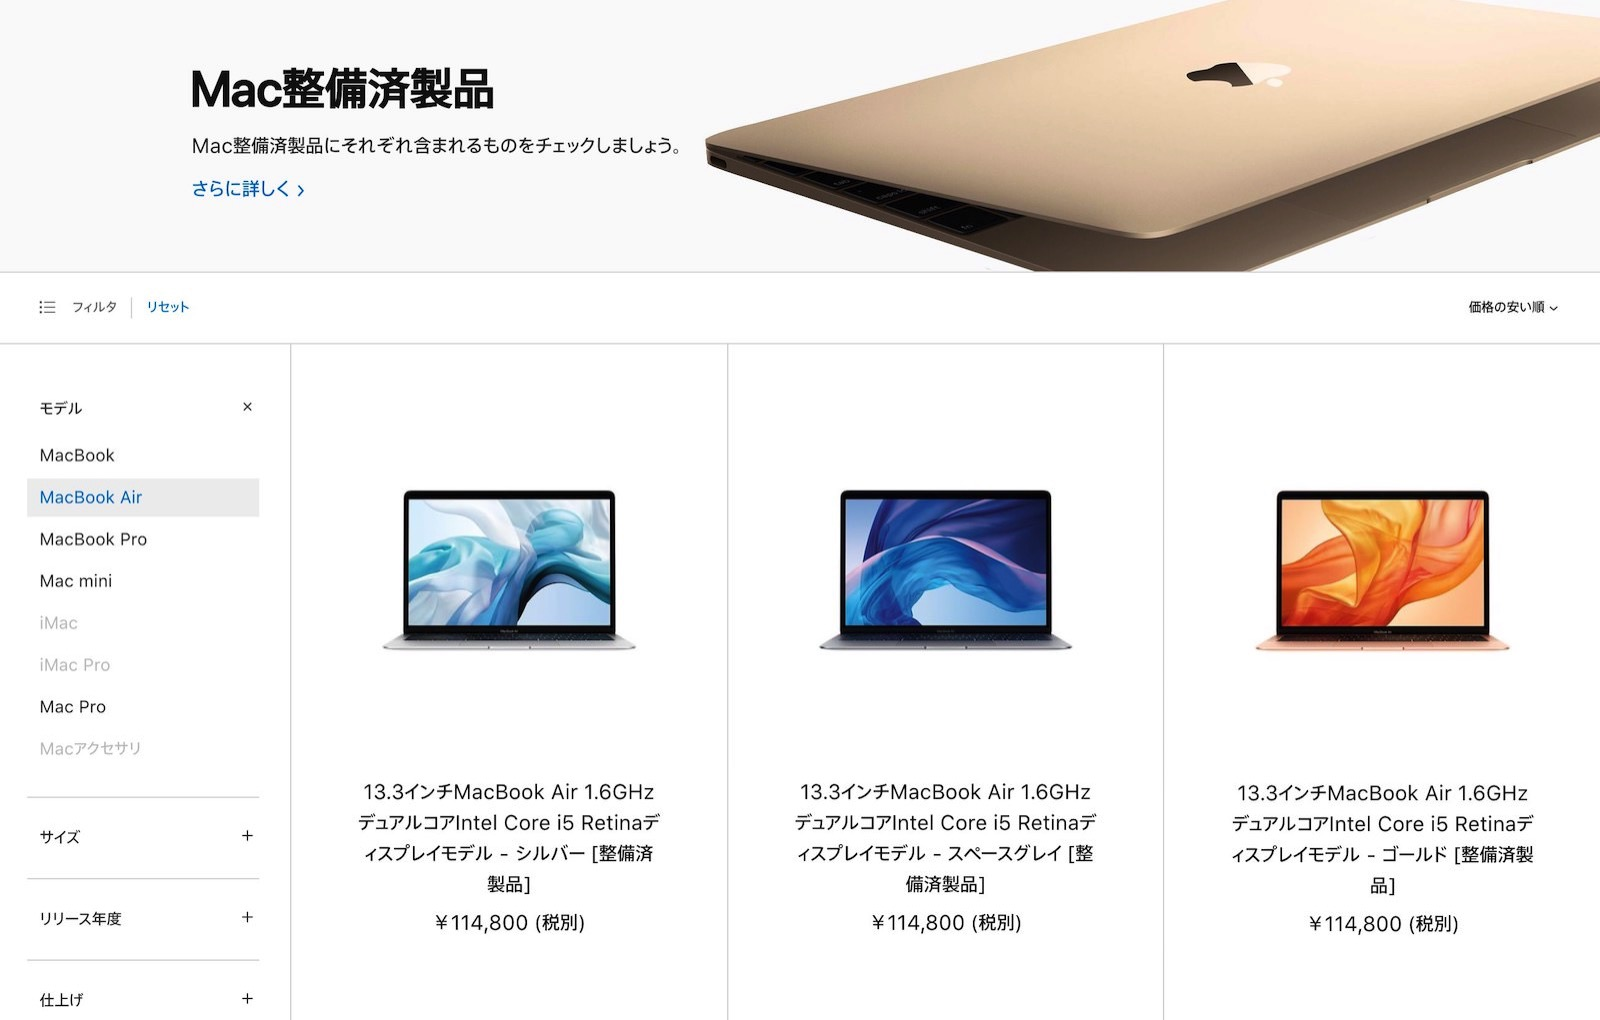 MacBook Air(2018) Refurbished 20190220